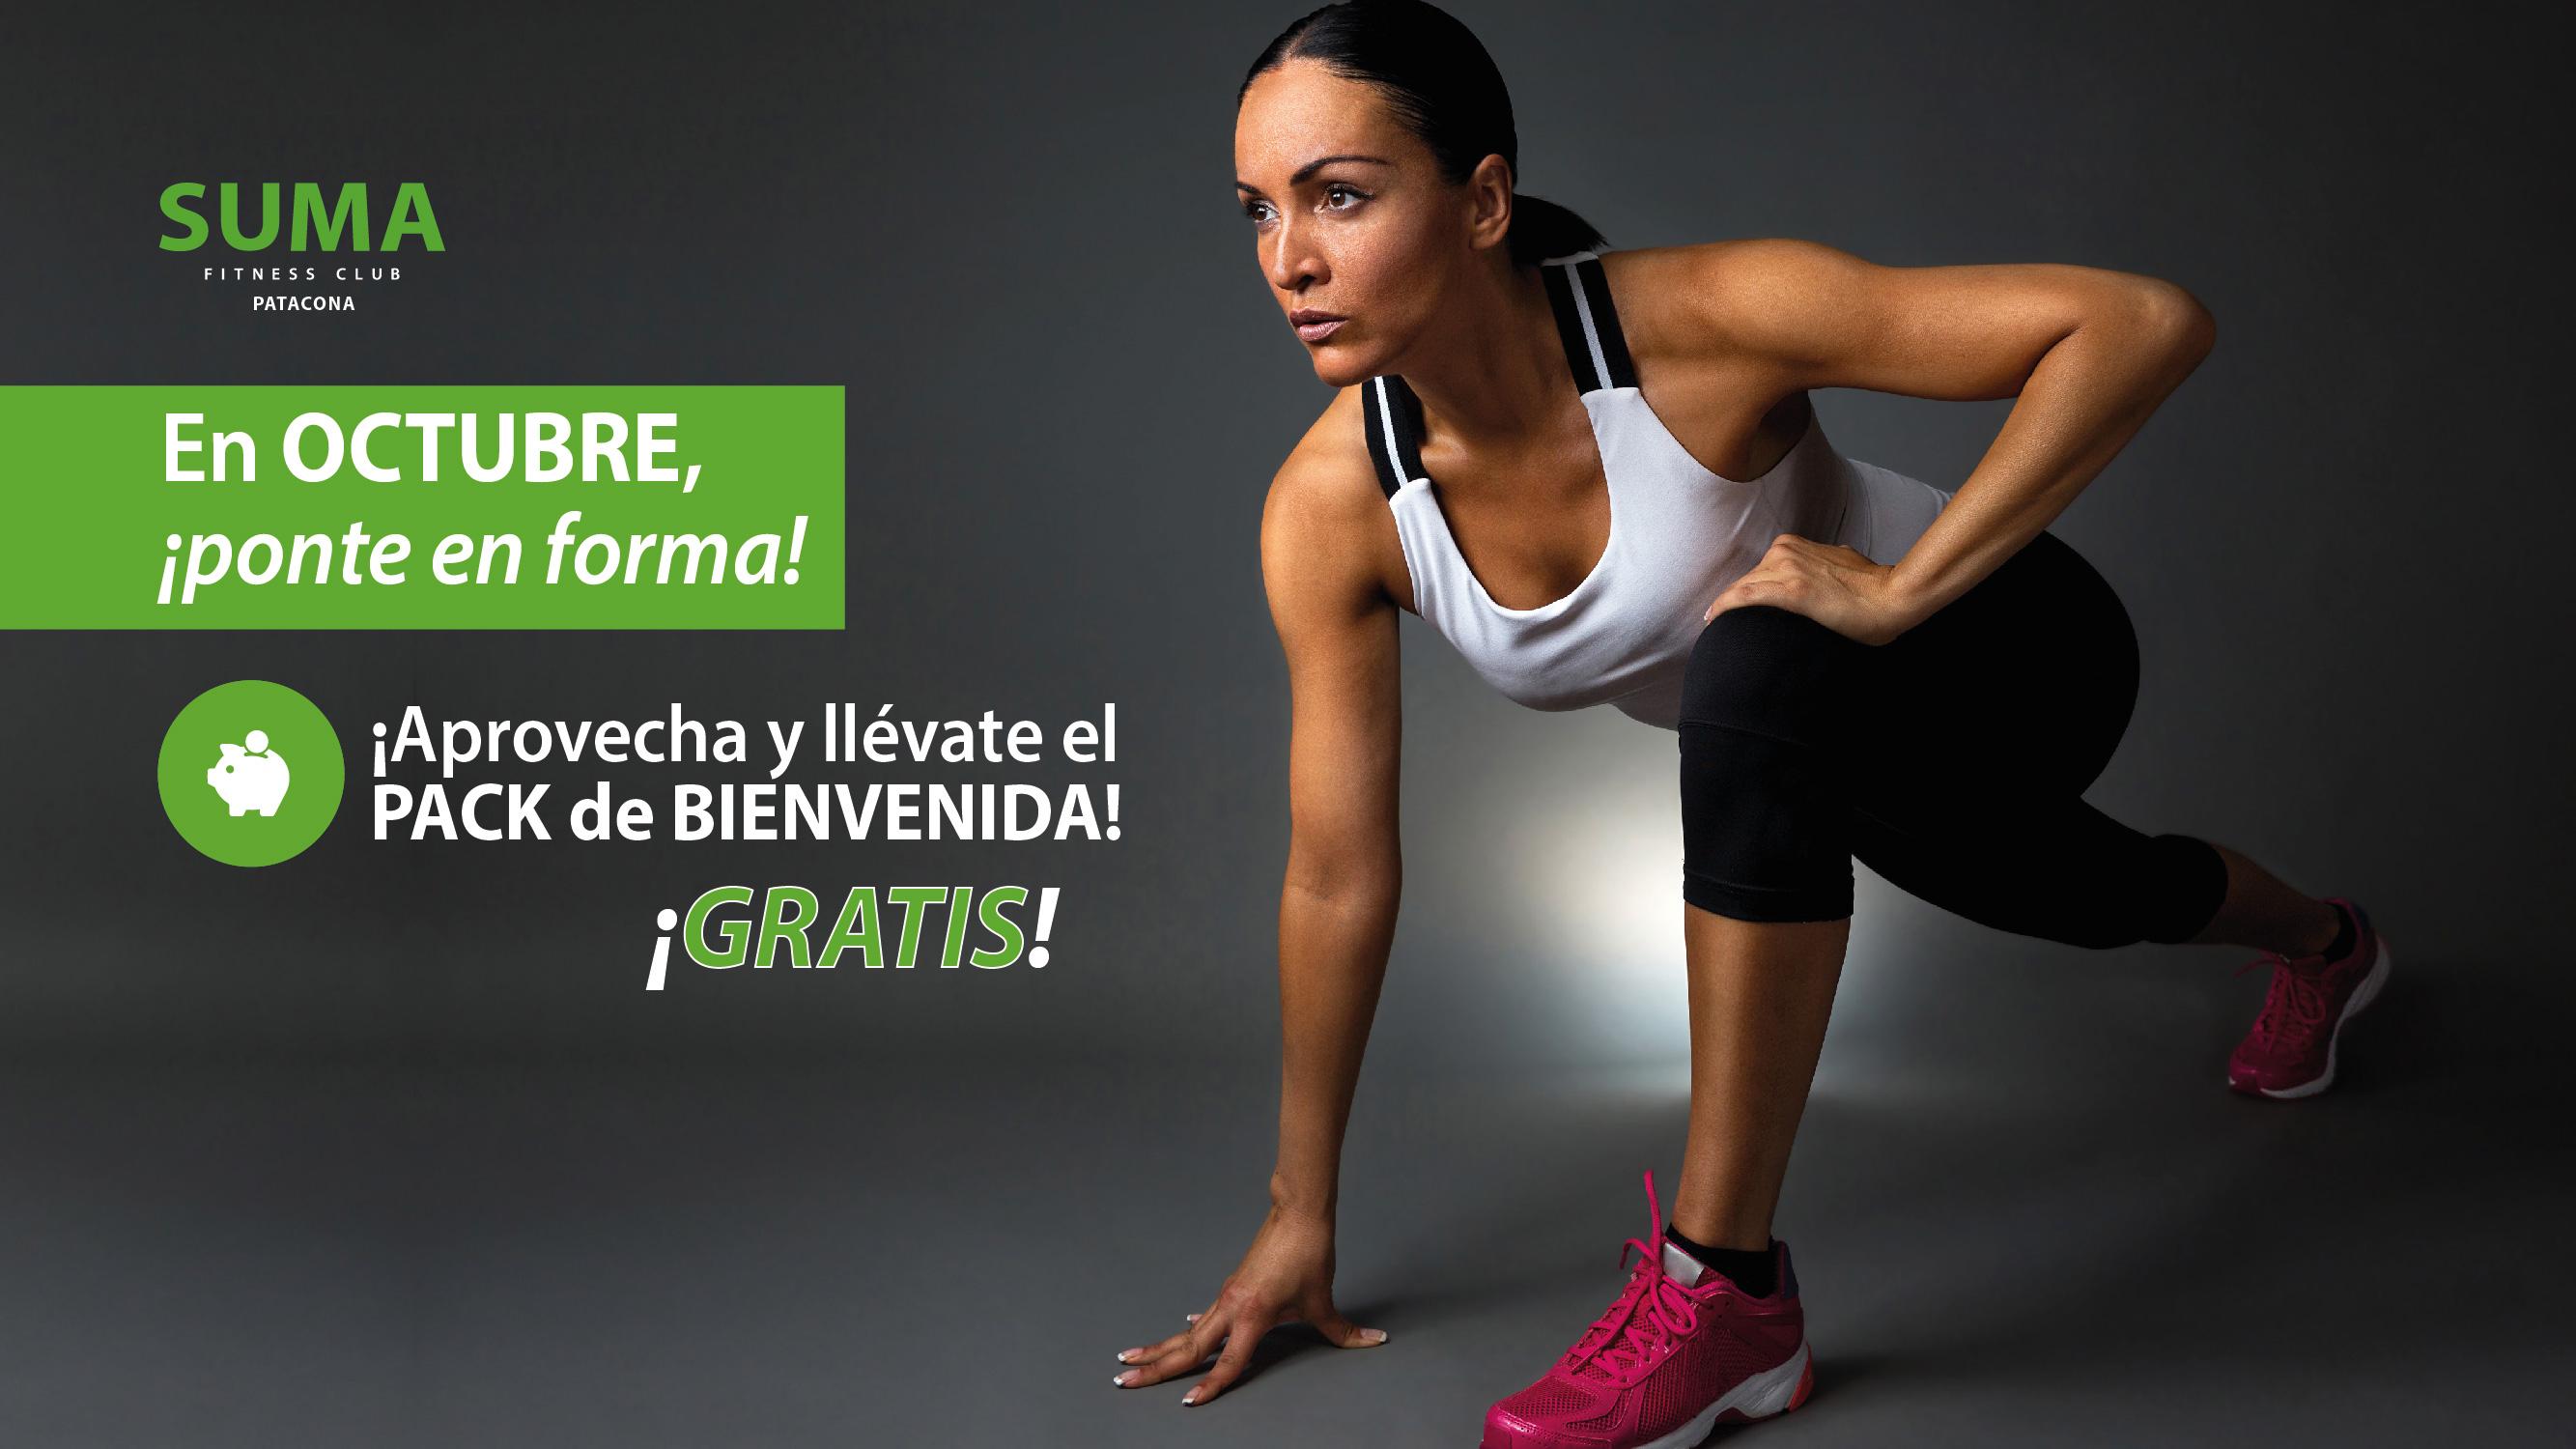 oferta-gimnasio-valencia-pack-bienvenida-octubre-suma-patacona